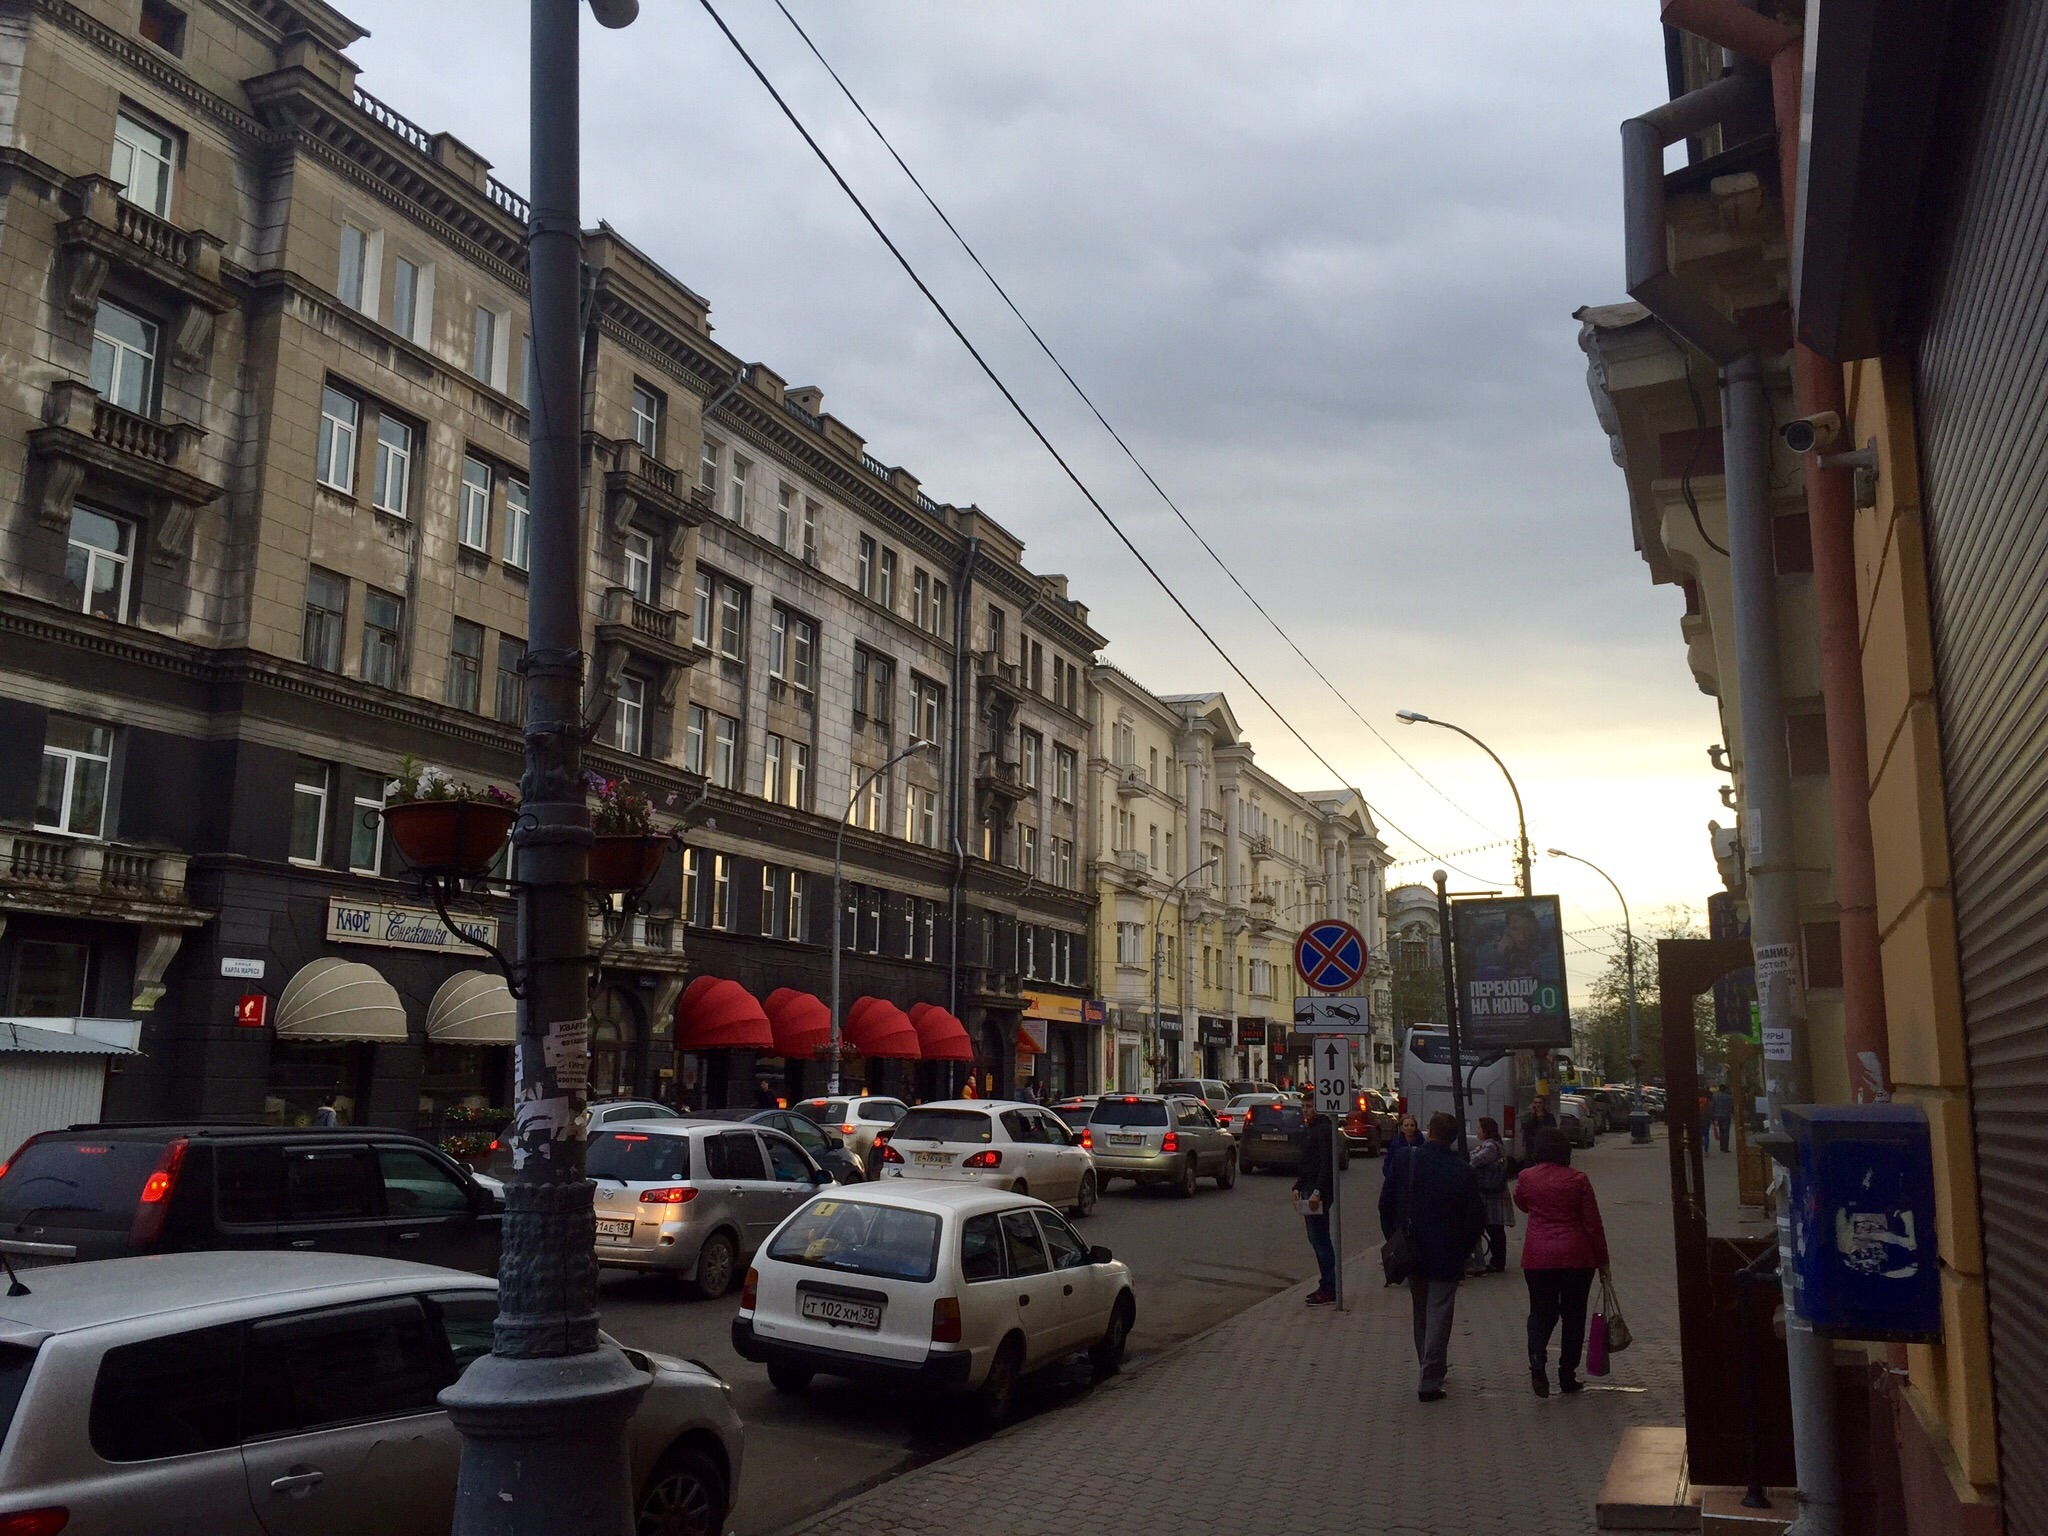 One of the main streets in Irkutsk.